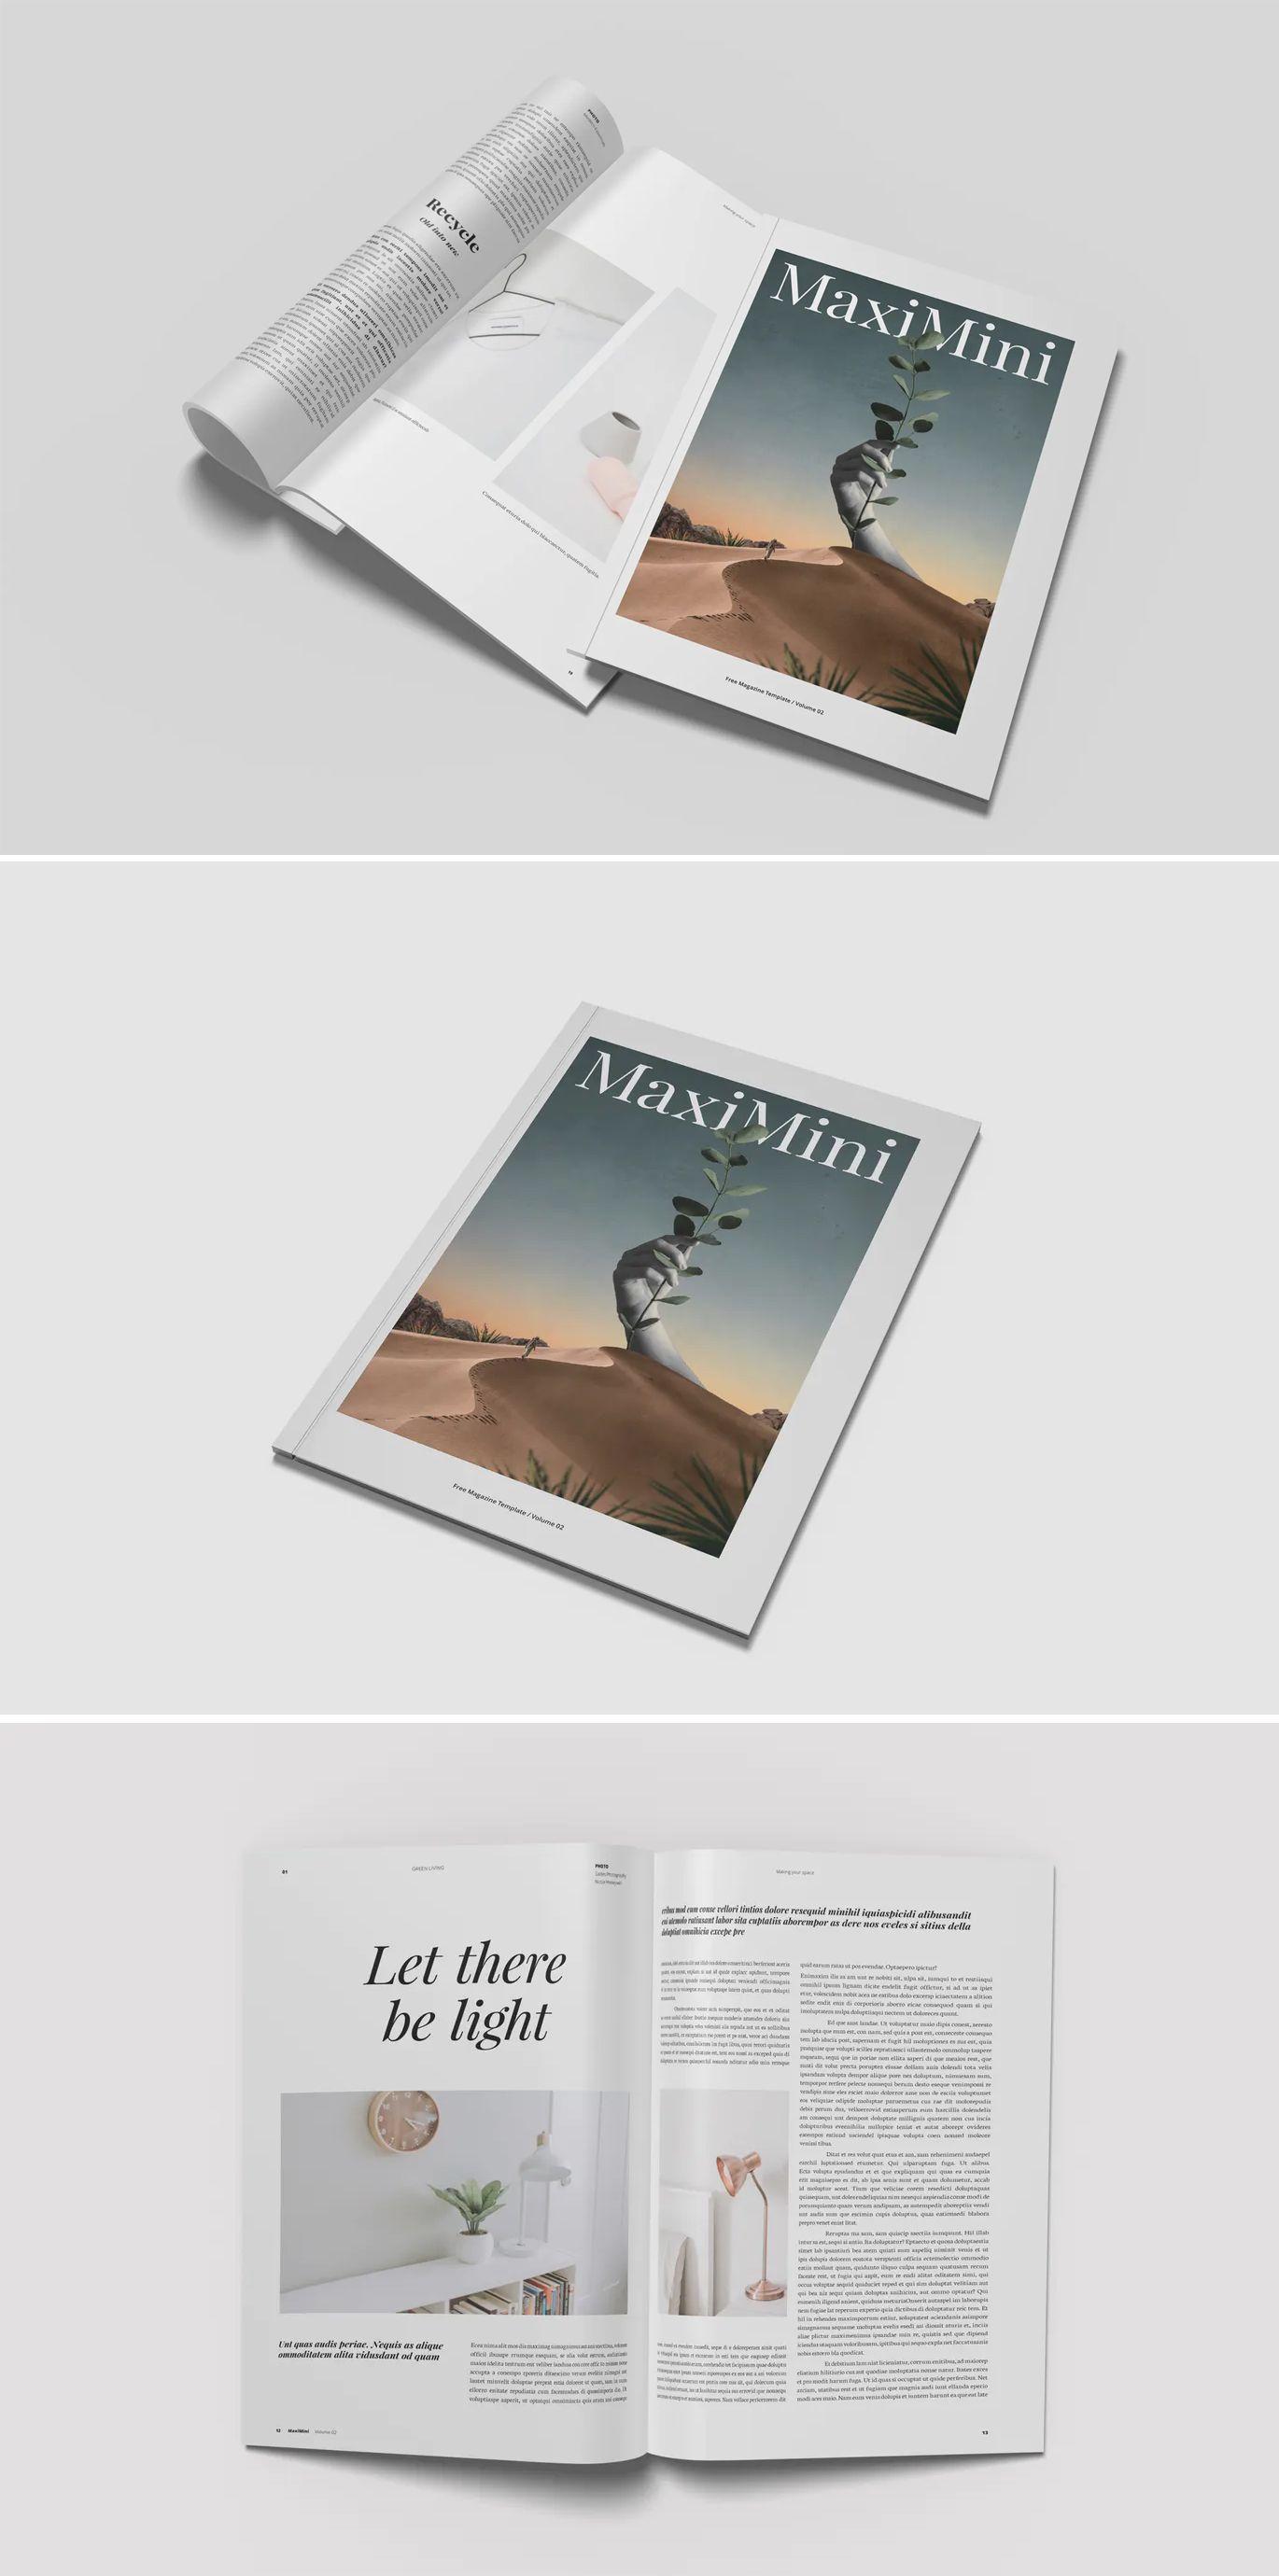 Minimalist Magazine Mockup Magazine Mockup Mockup Design Template